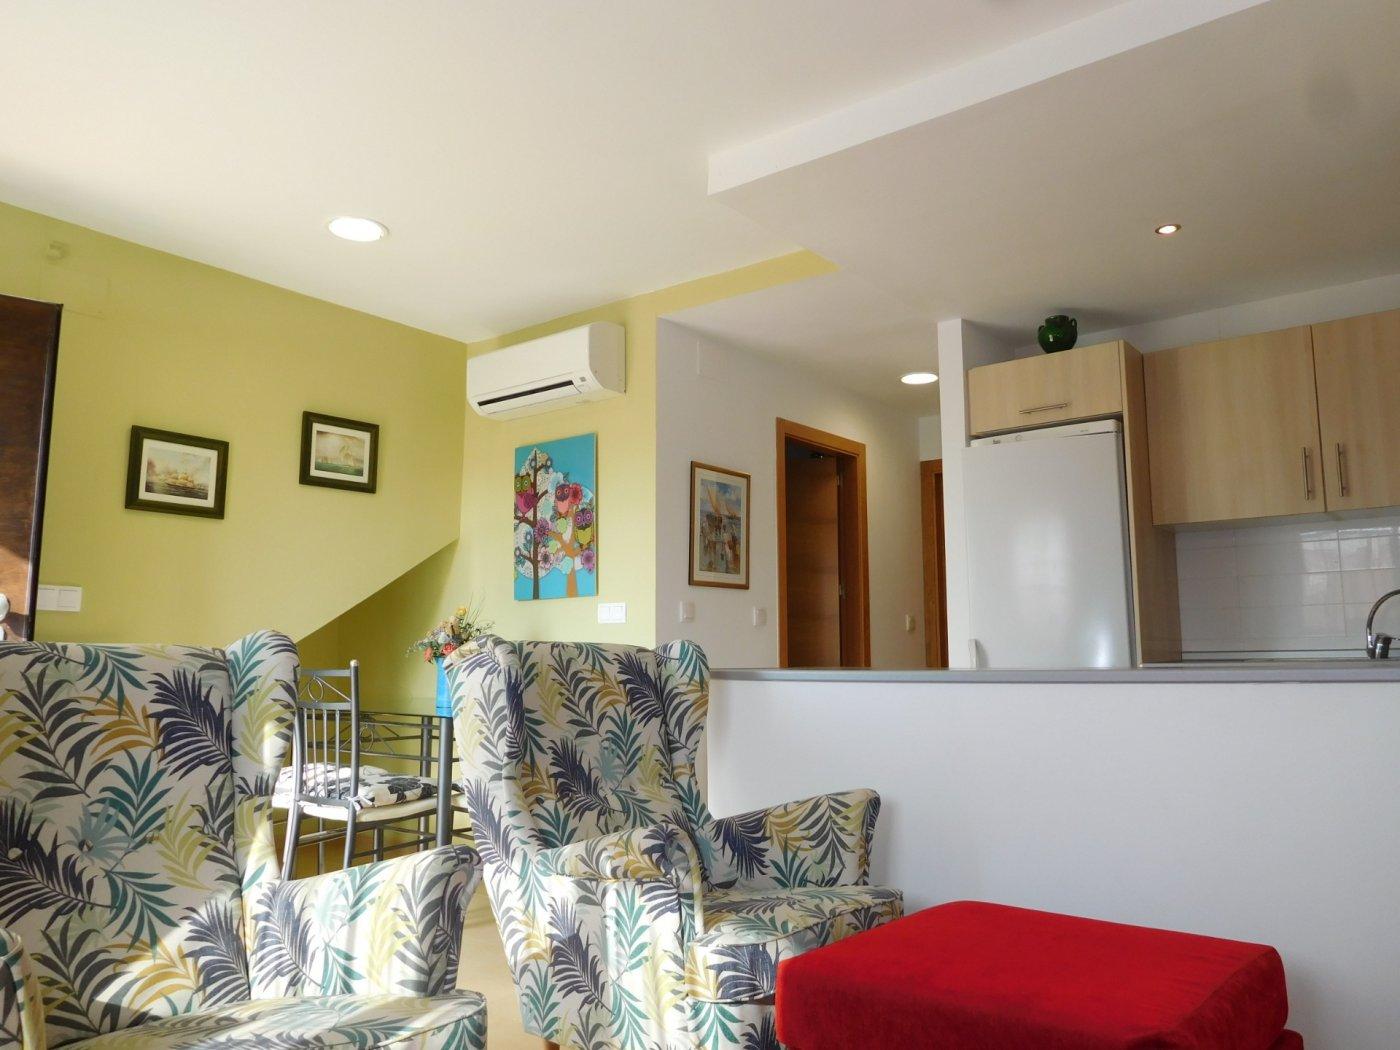 Image 2 Amarre ref 3265-03033 for rent in Condado De Alhama Spain - Quality Homes Costa Cálida